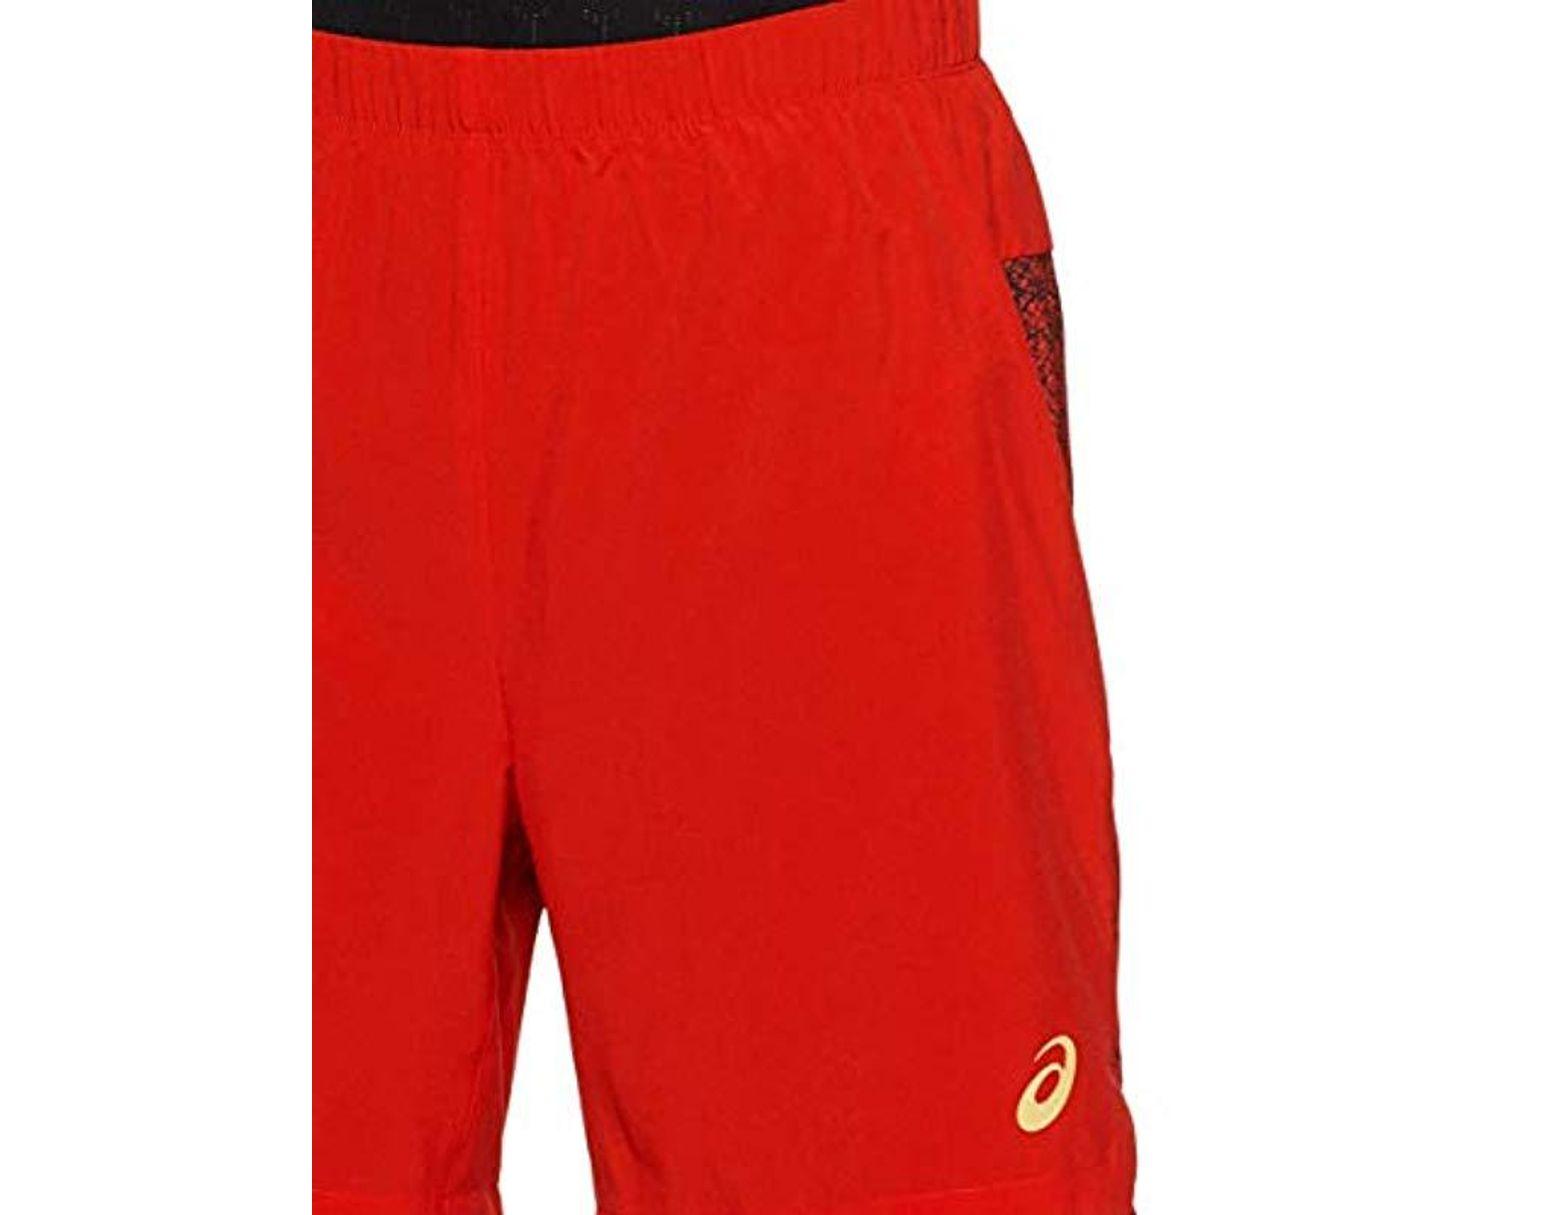 8361dbe816 Men's Red 2 In 1 7inch Running Shorts